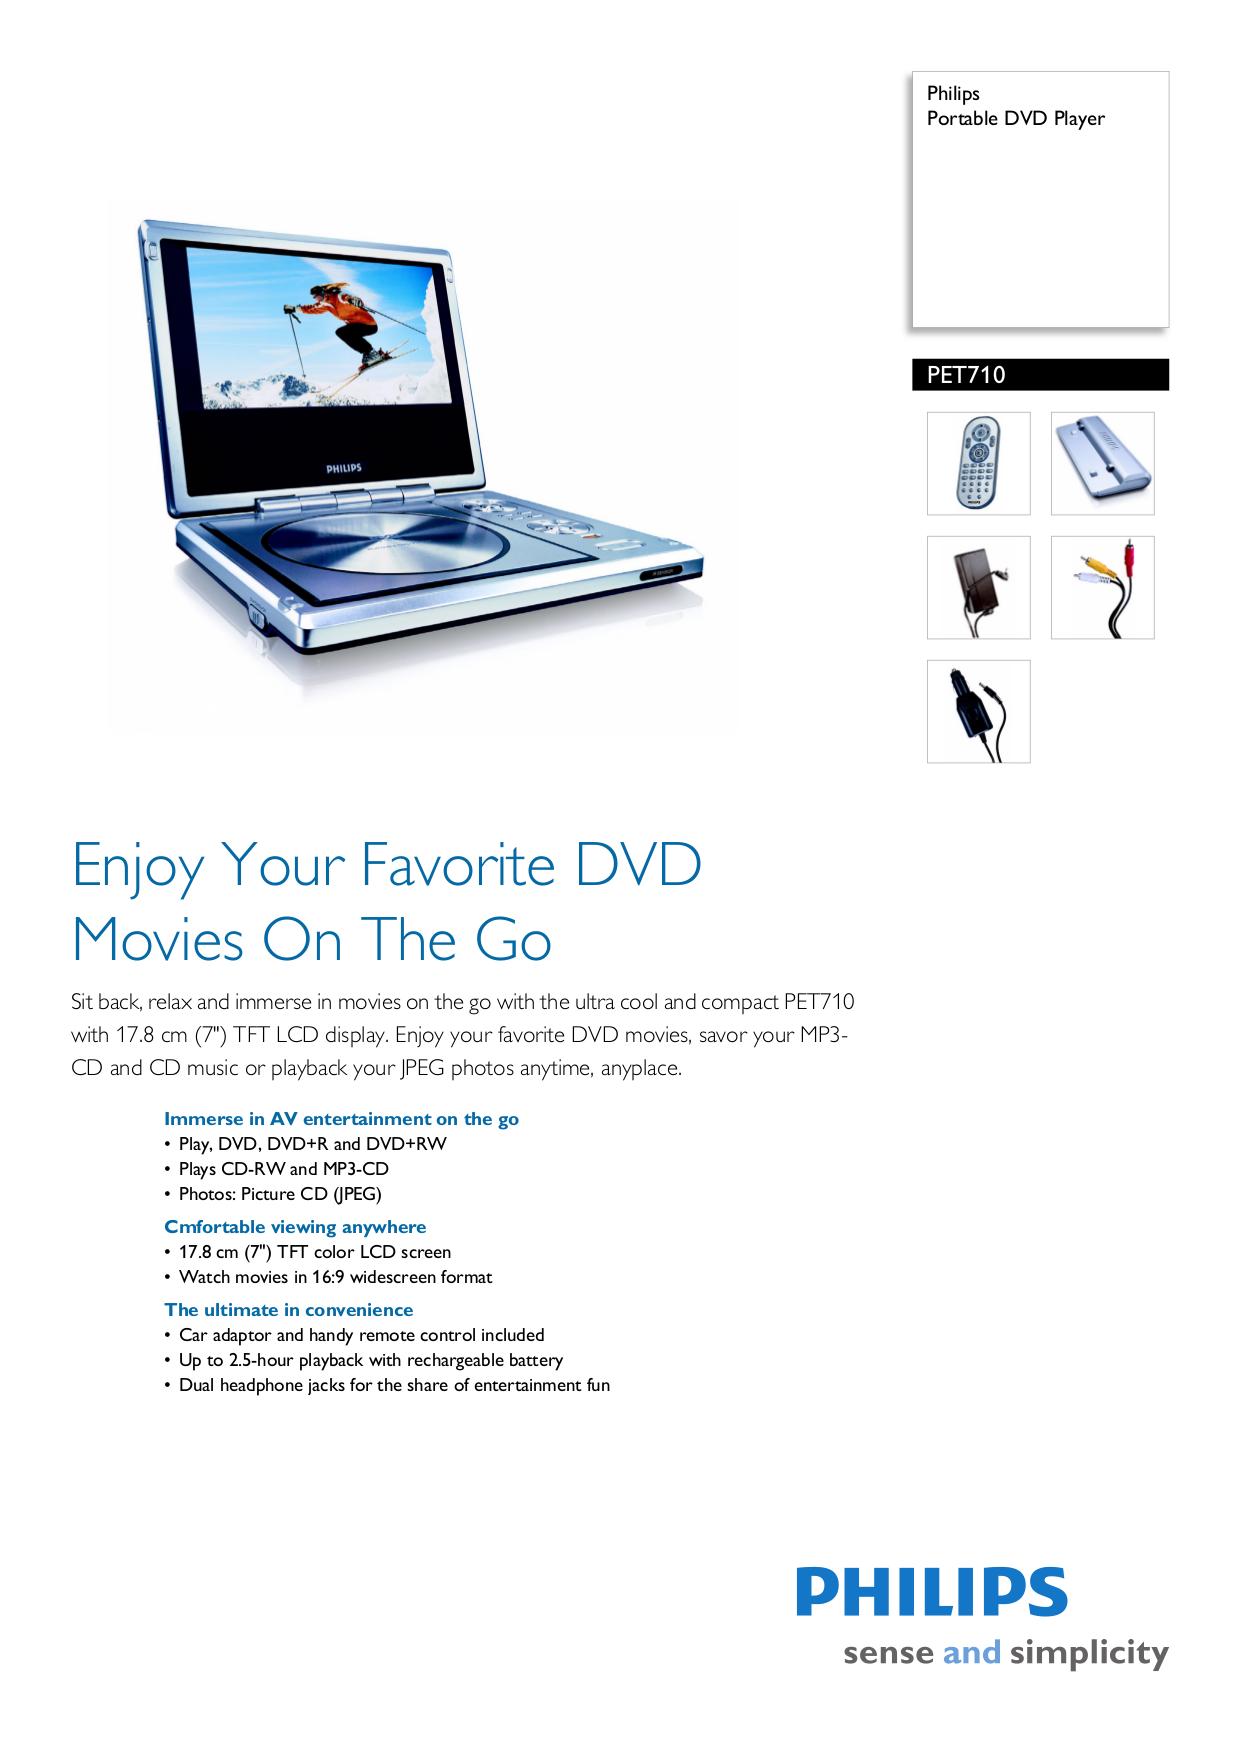 download free pdf for philips pet710 portable dvd player manual rh umlib com Philips Portable DVD Players Discount Philips DVD Players for Cars